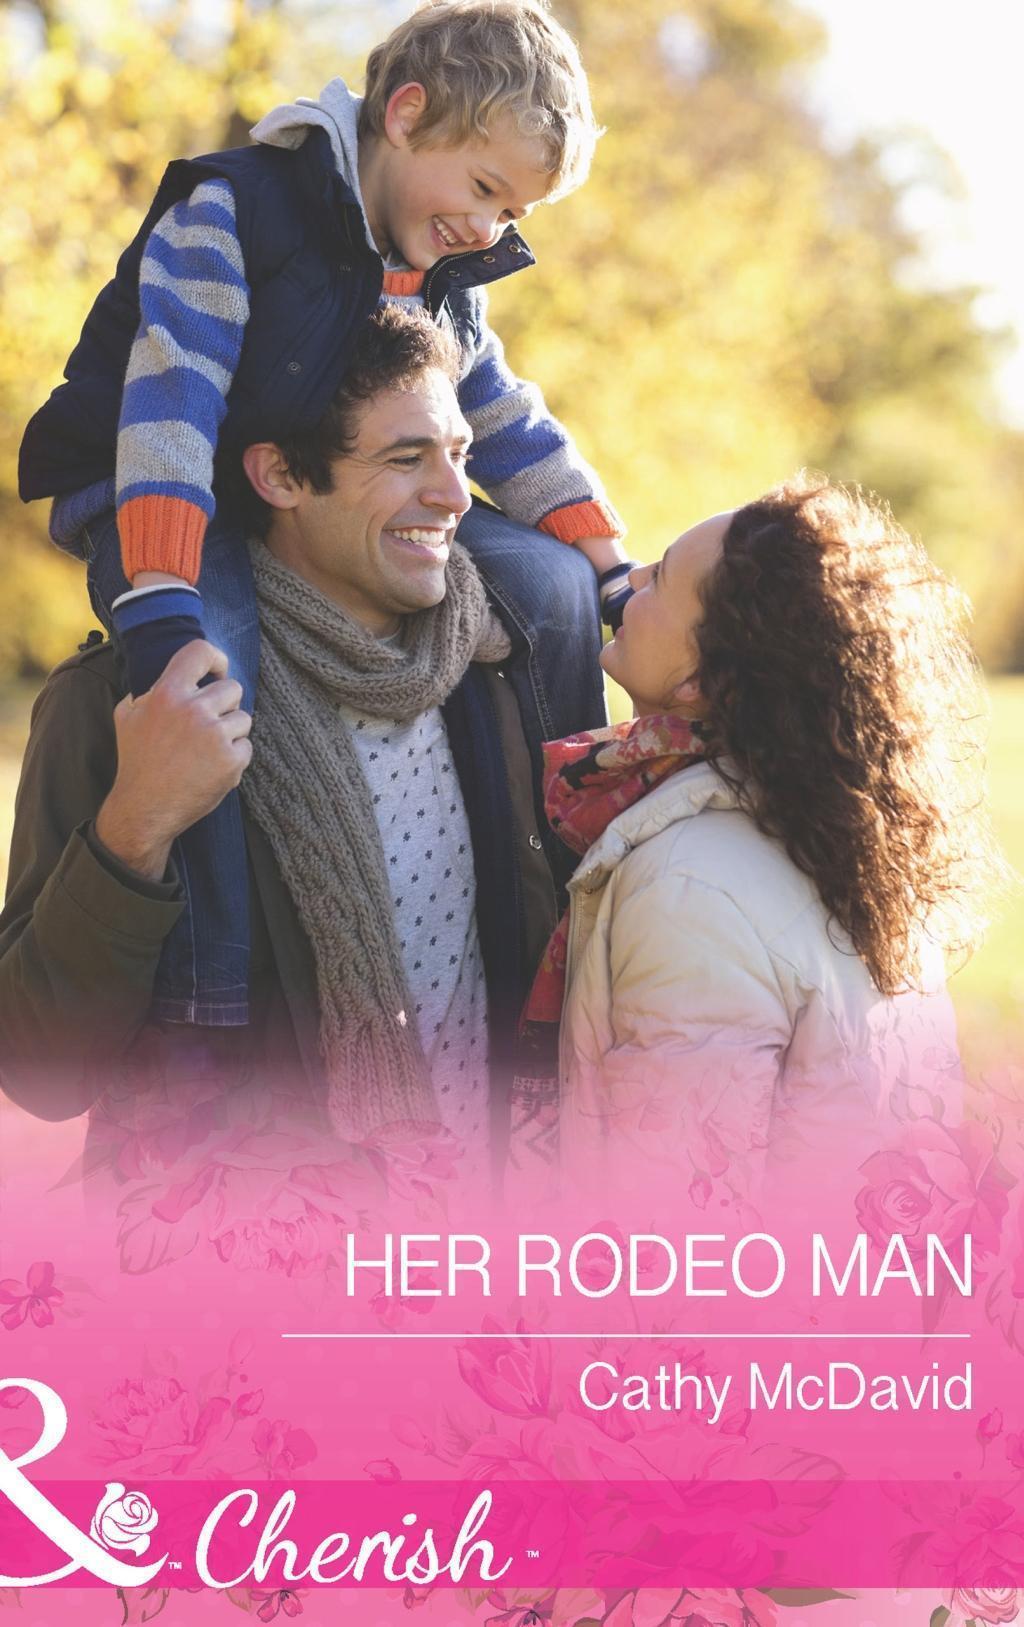 Her Rodeo Man (Mills & Boon Cherish) (Reckless, Arizona, Book 2)